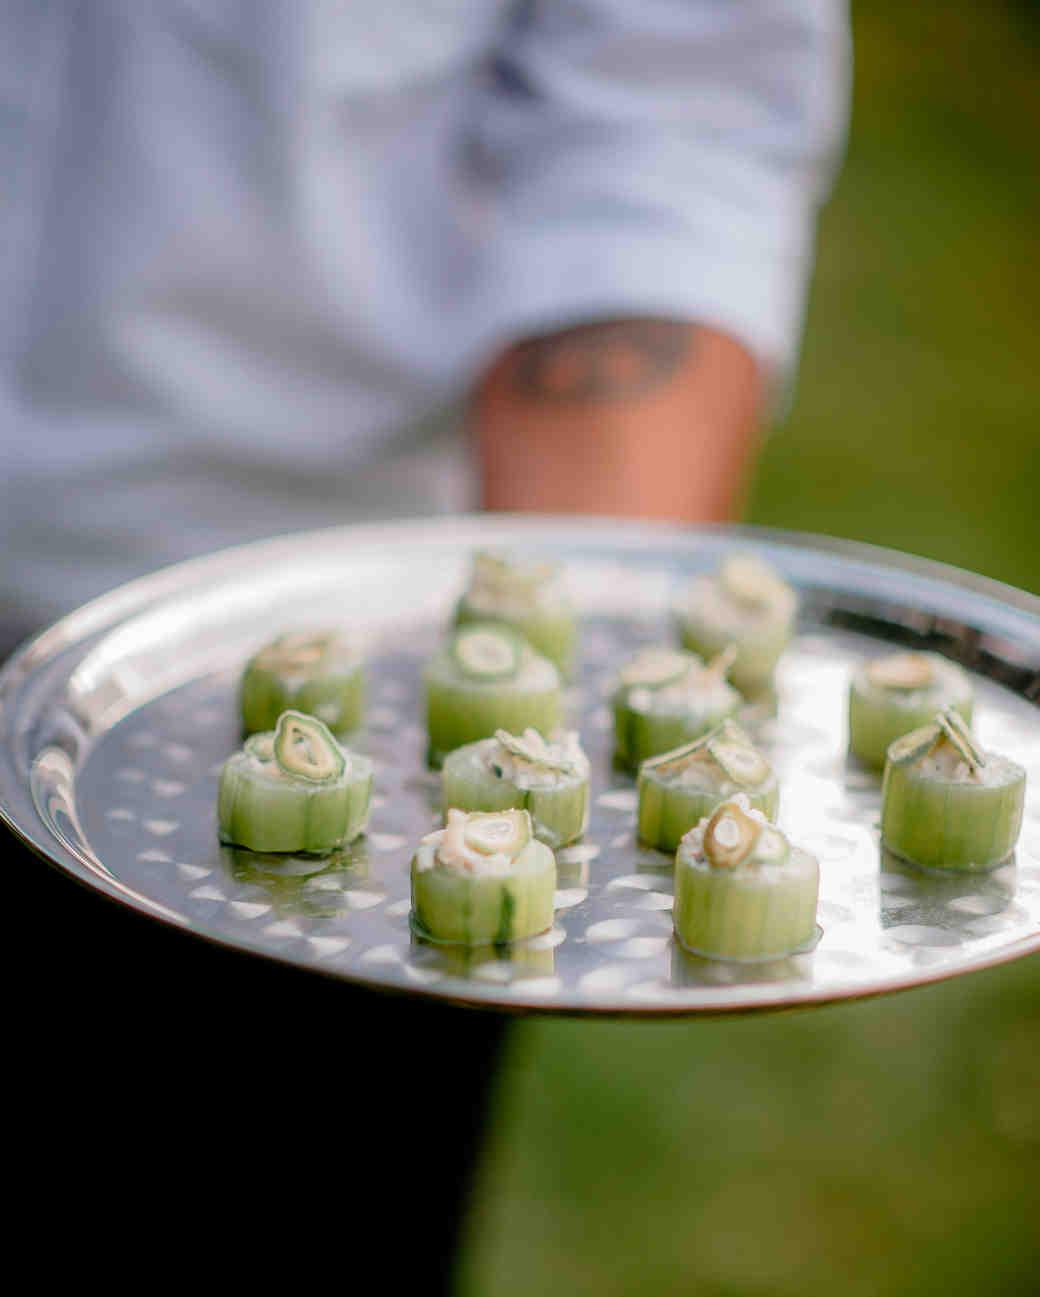 melany-drew-wedding-appetizers-086-s112184-0915.jpg